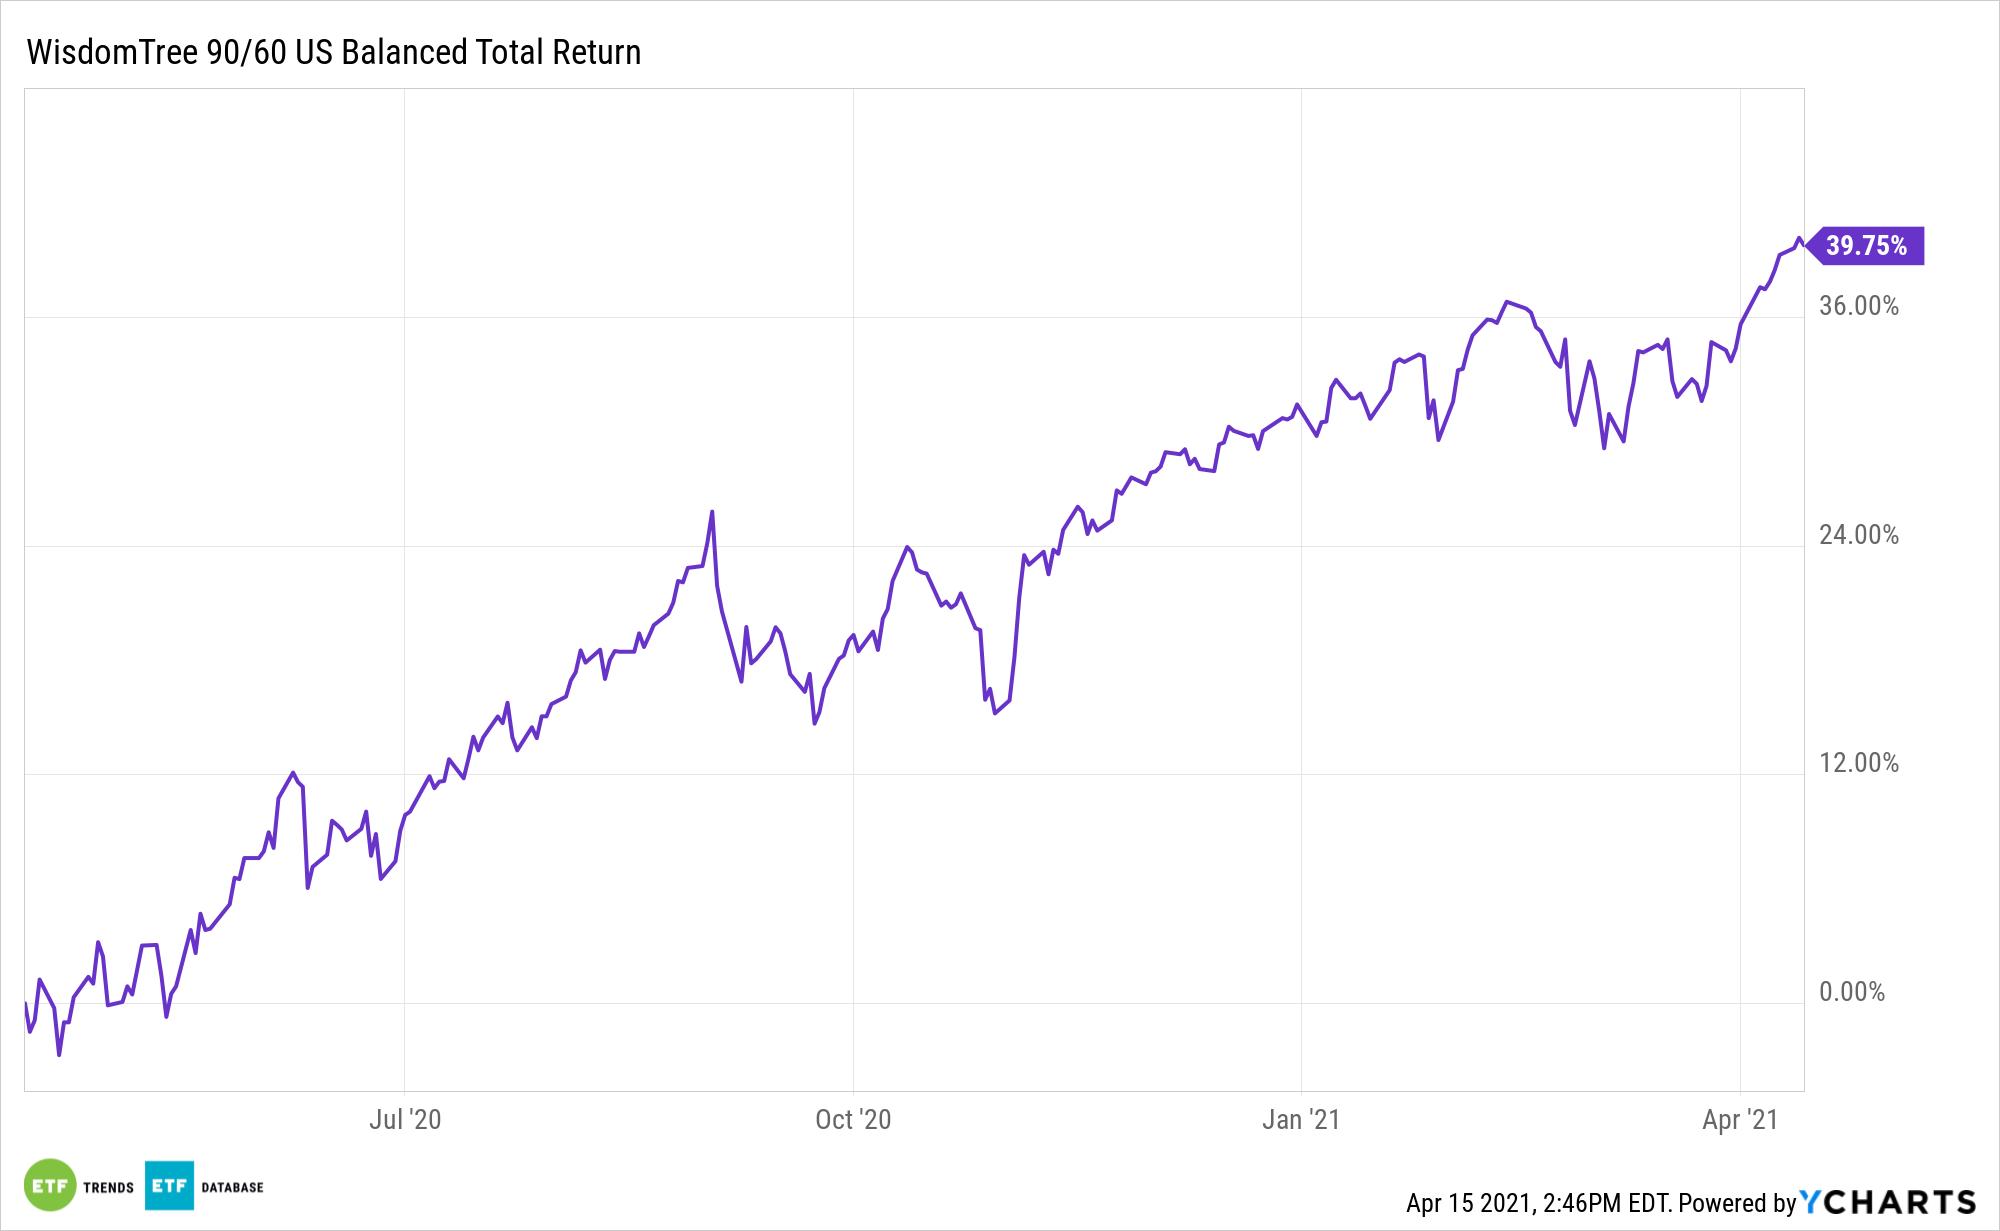 NTSX 1 Year Total Return